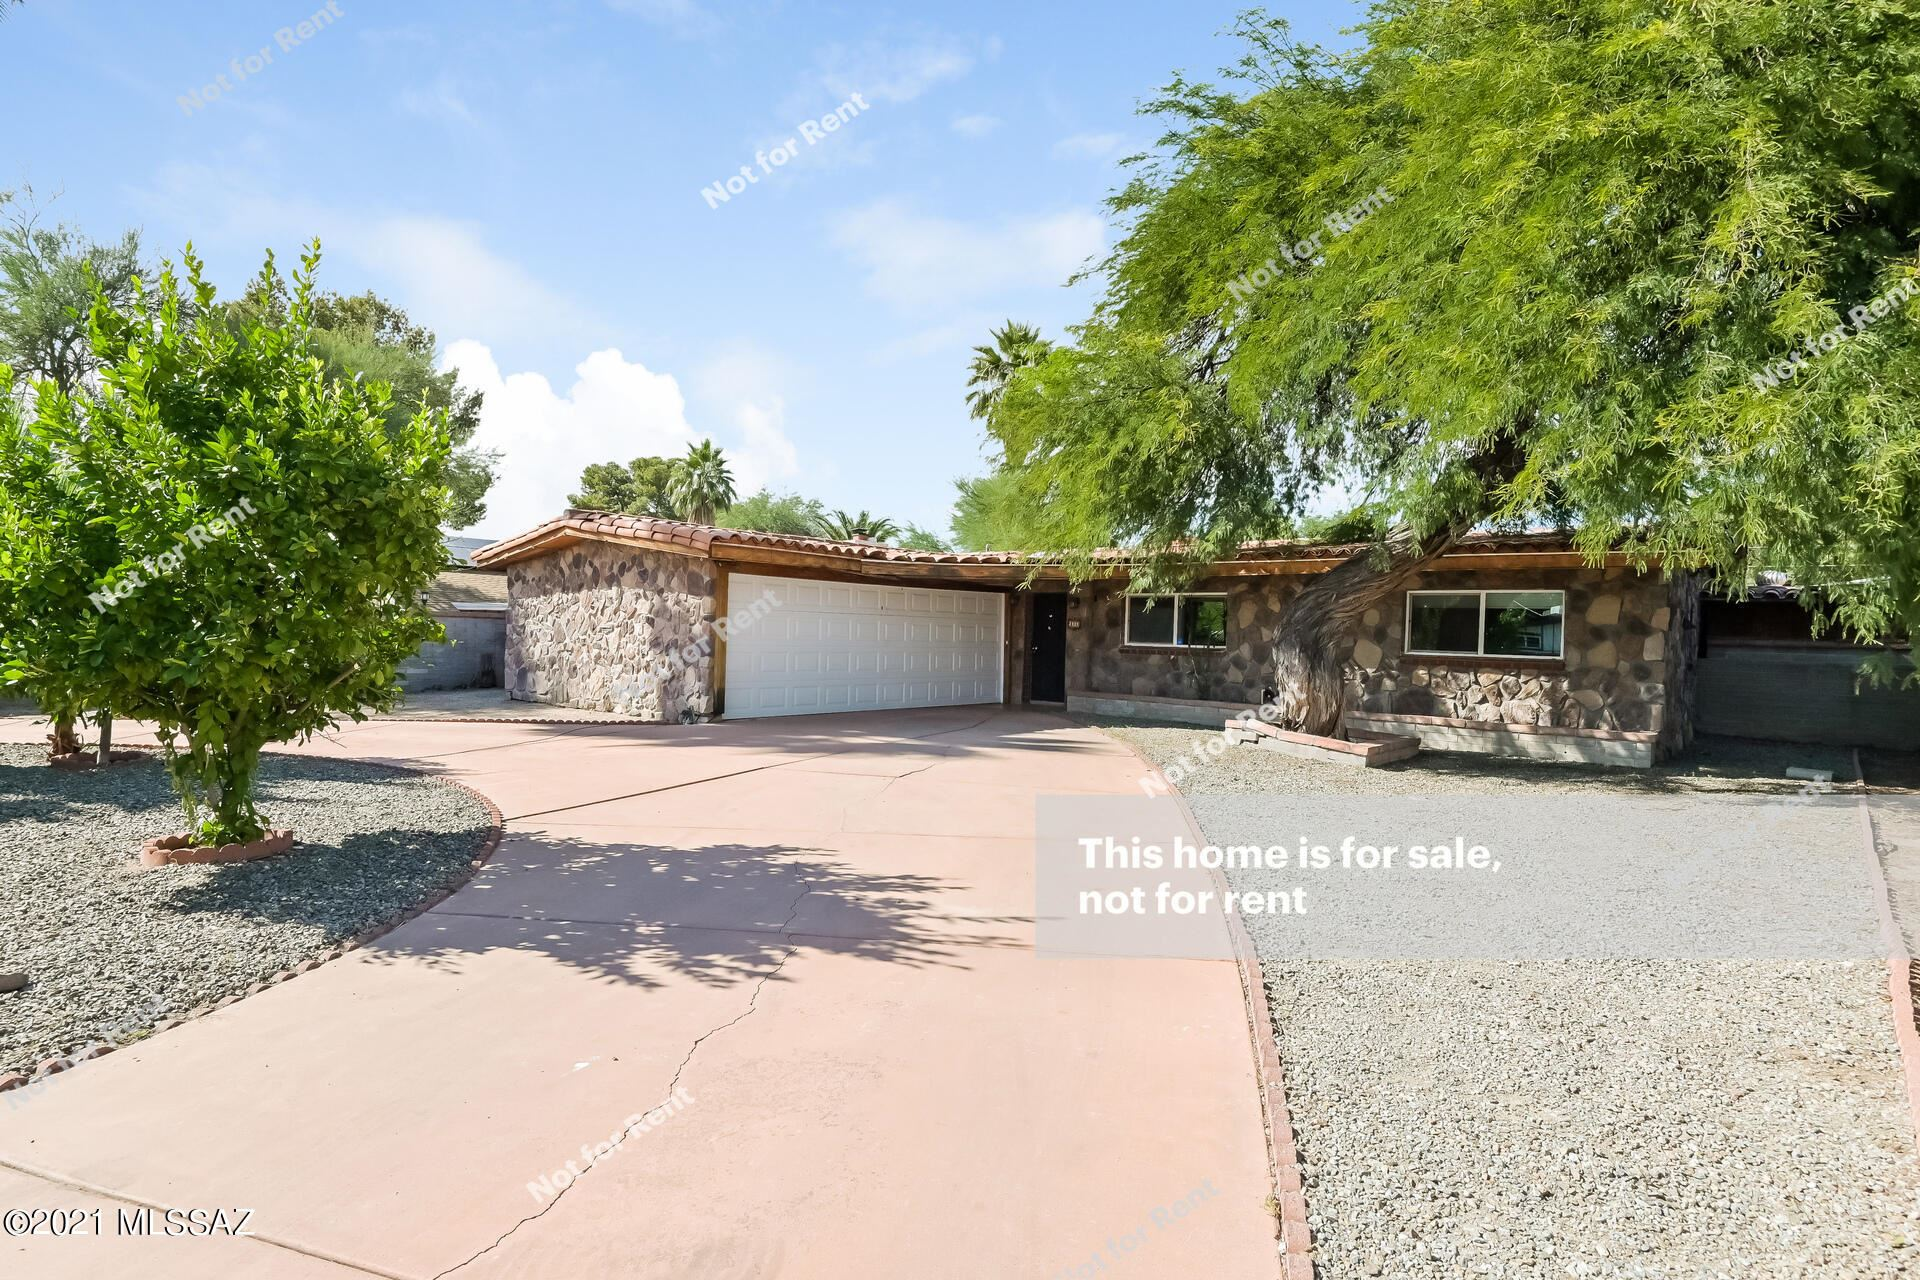 2121 E Florence Drive, Tucson, AZ 85719 - MLS#: 22124916